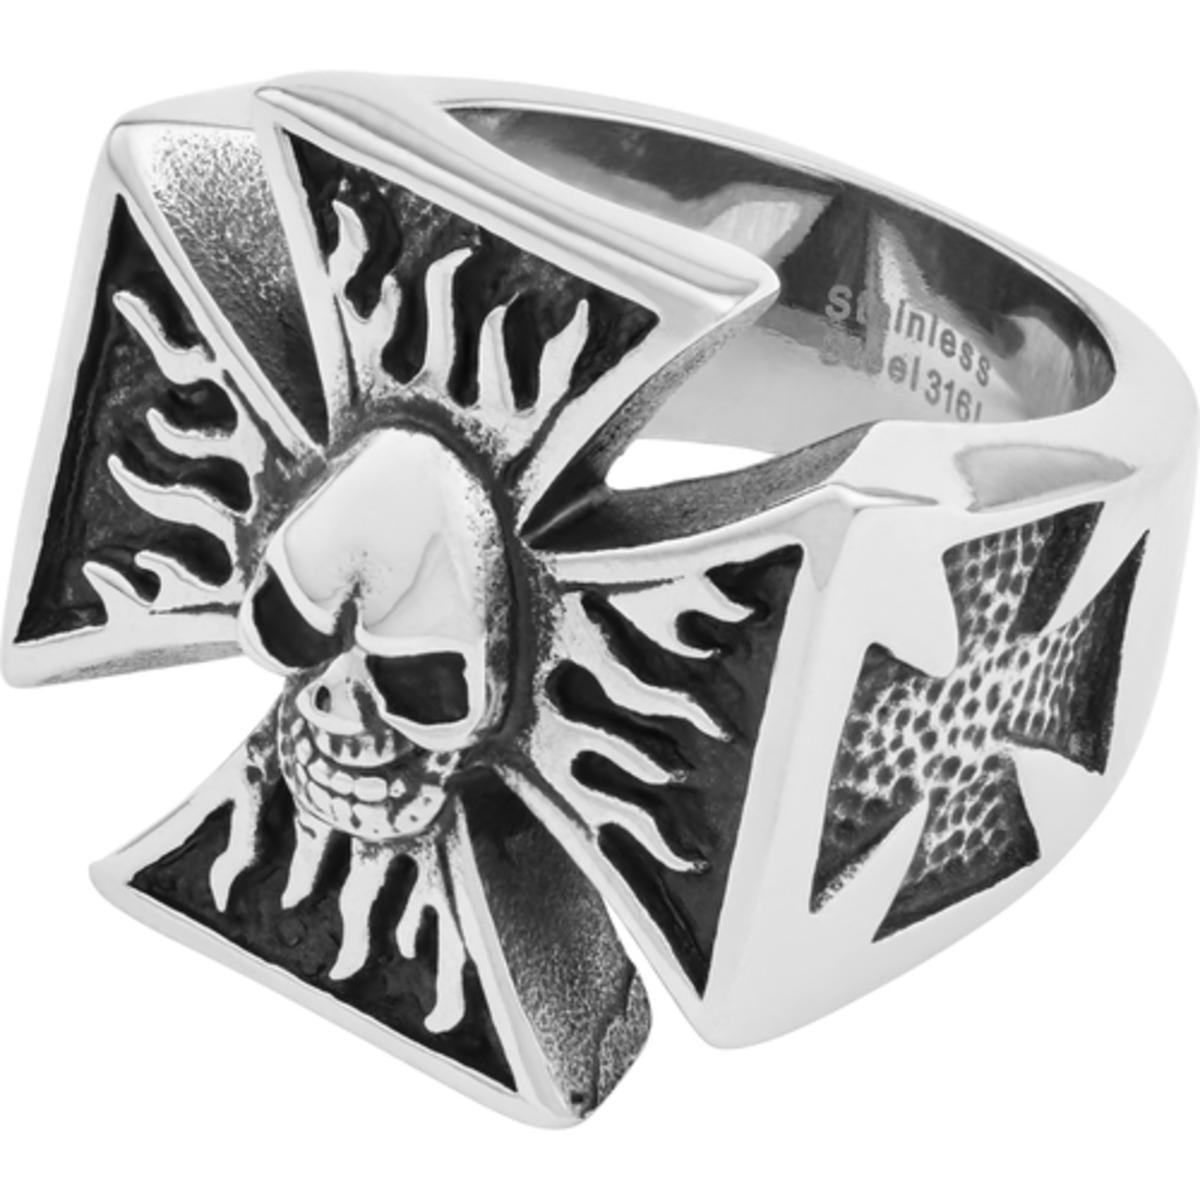 "Bild 1 von Spirit Motors Edelstahlring ""Iron Cross & Skull"" silber"